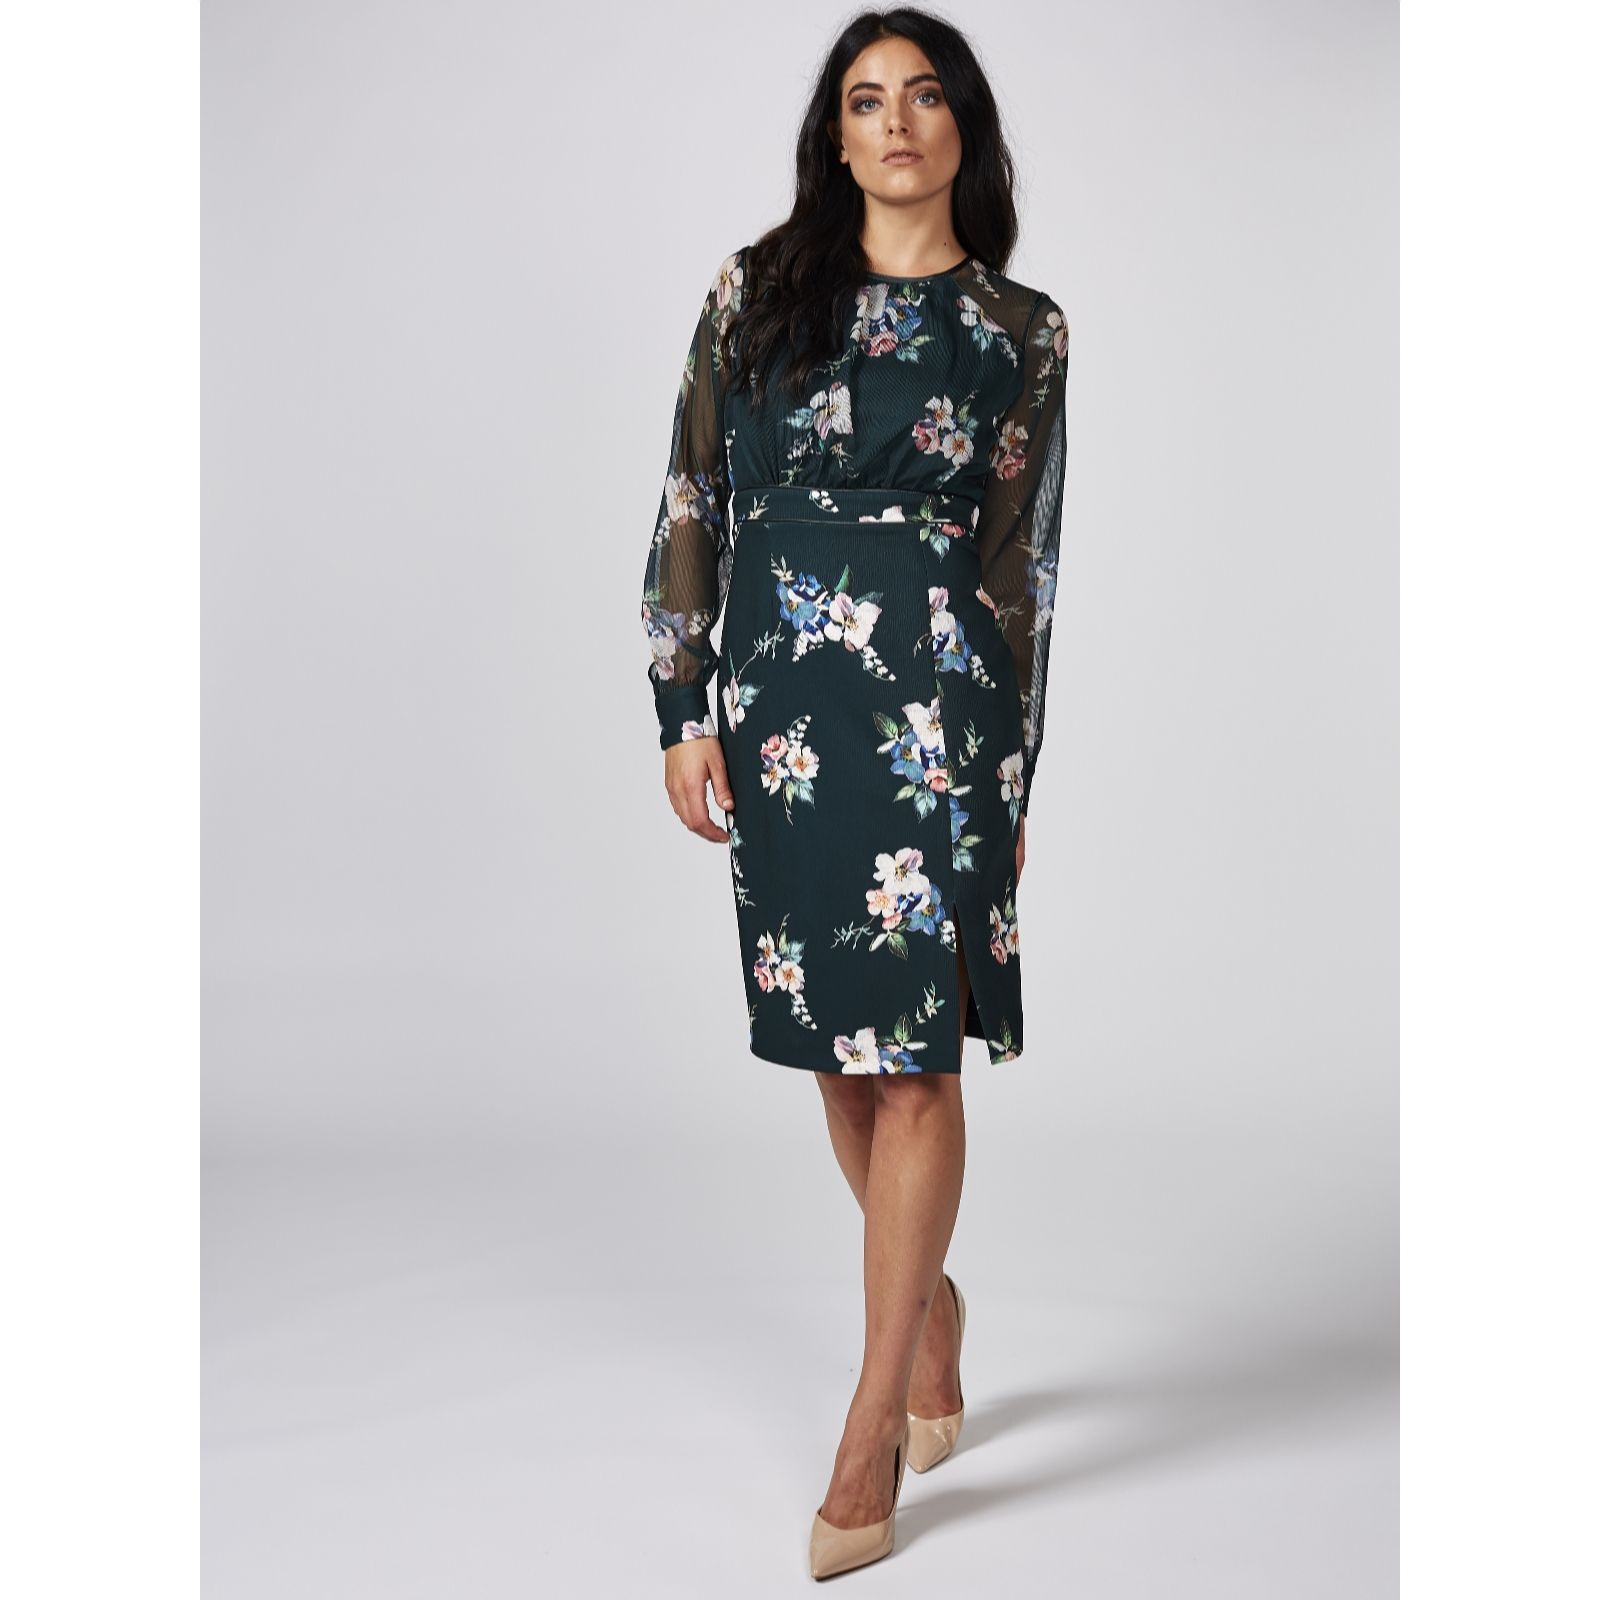 4c57a6cfedf Phase Eight Abrianna Print Dress - QVC UK